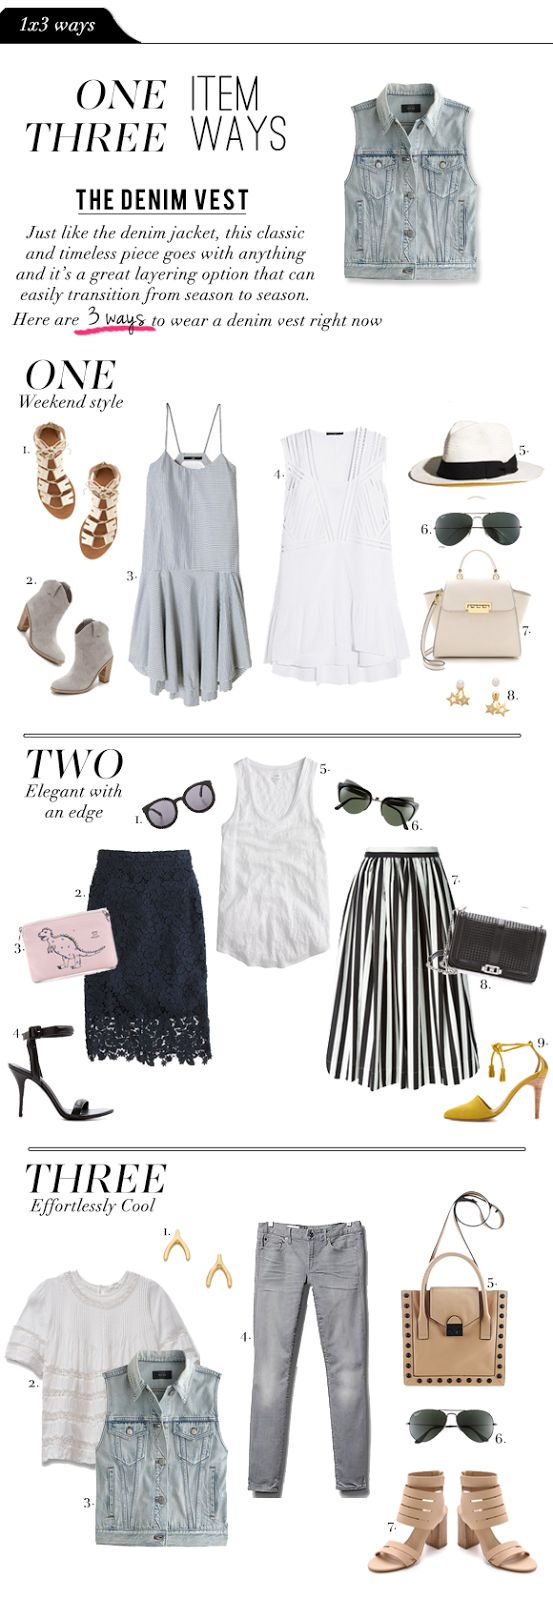 Fashion File: 1x3 Ways - The Denim Vest